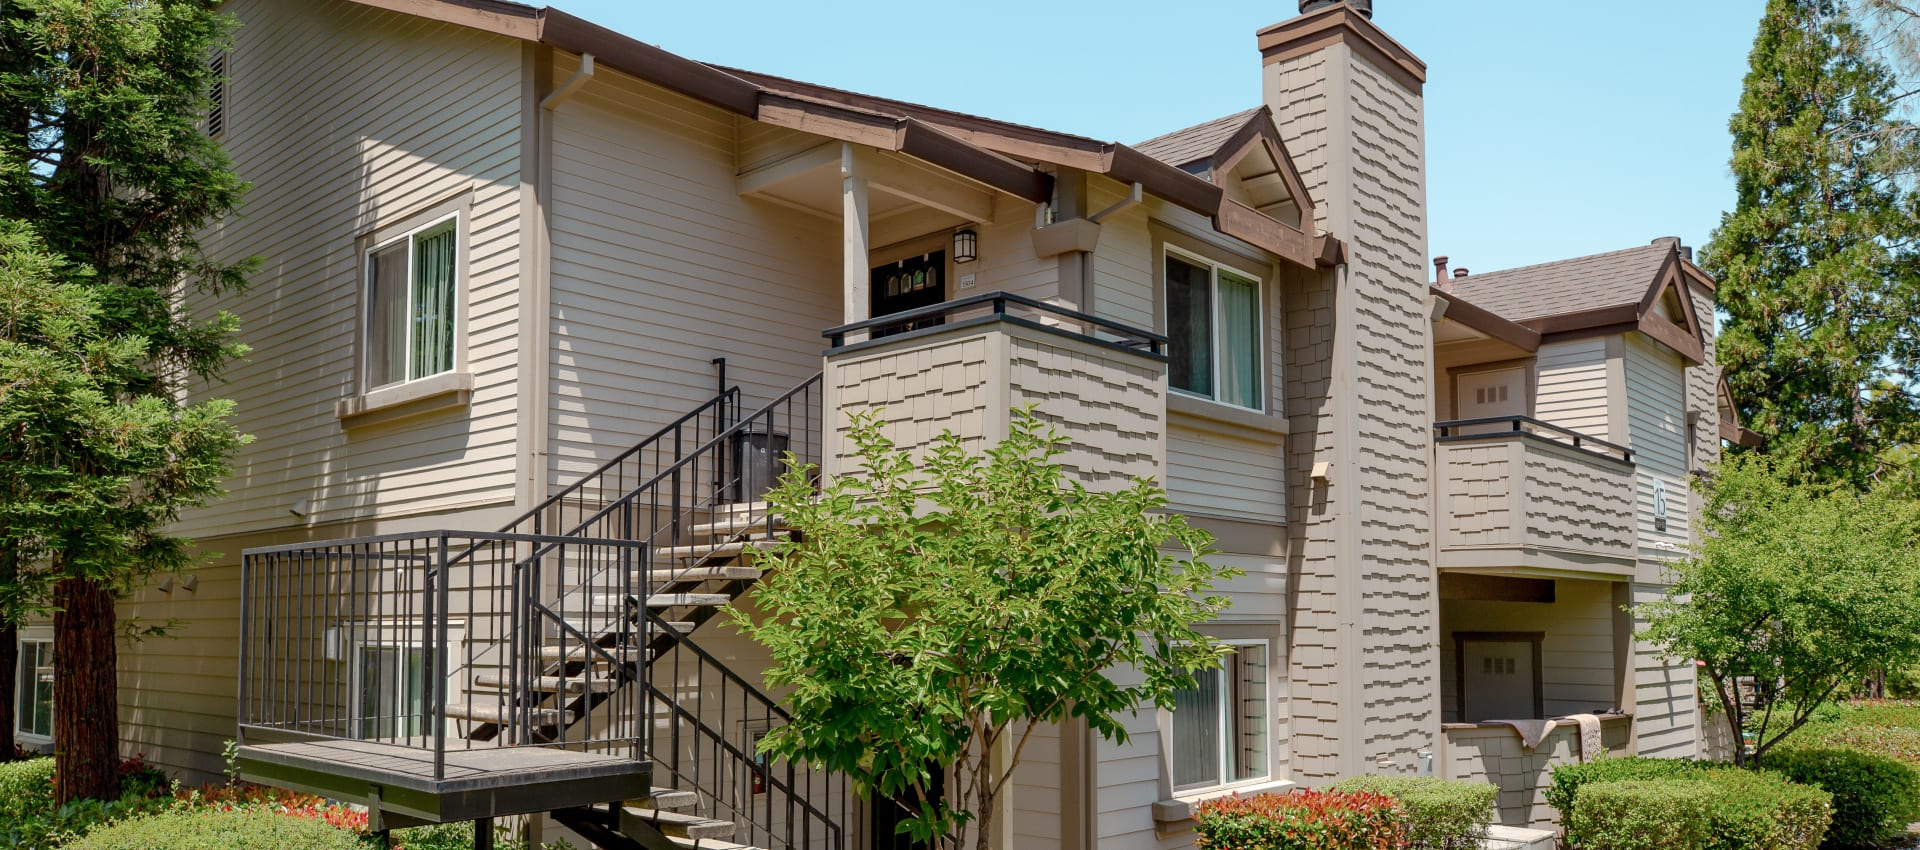 Balconies that overlook groomed property at Shaliko in Rocklin, California.